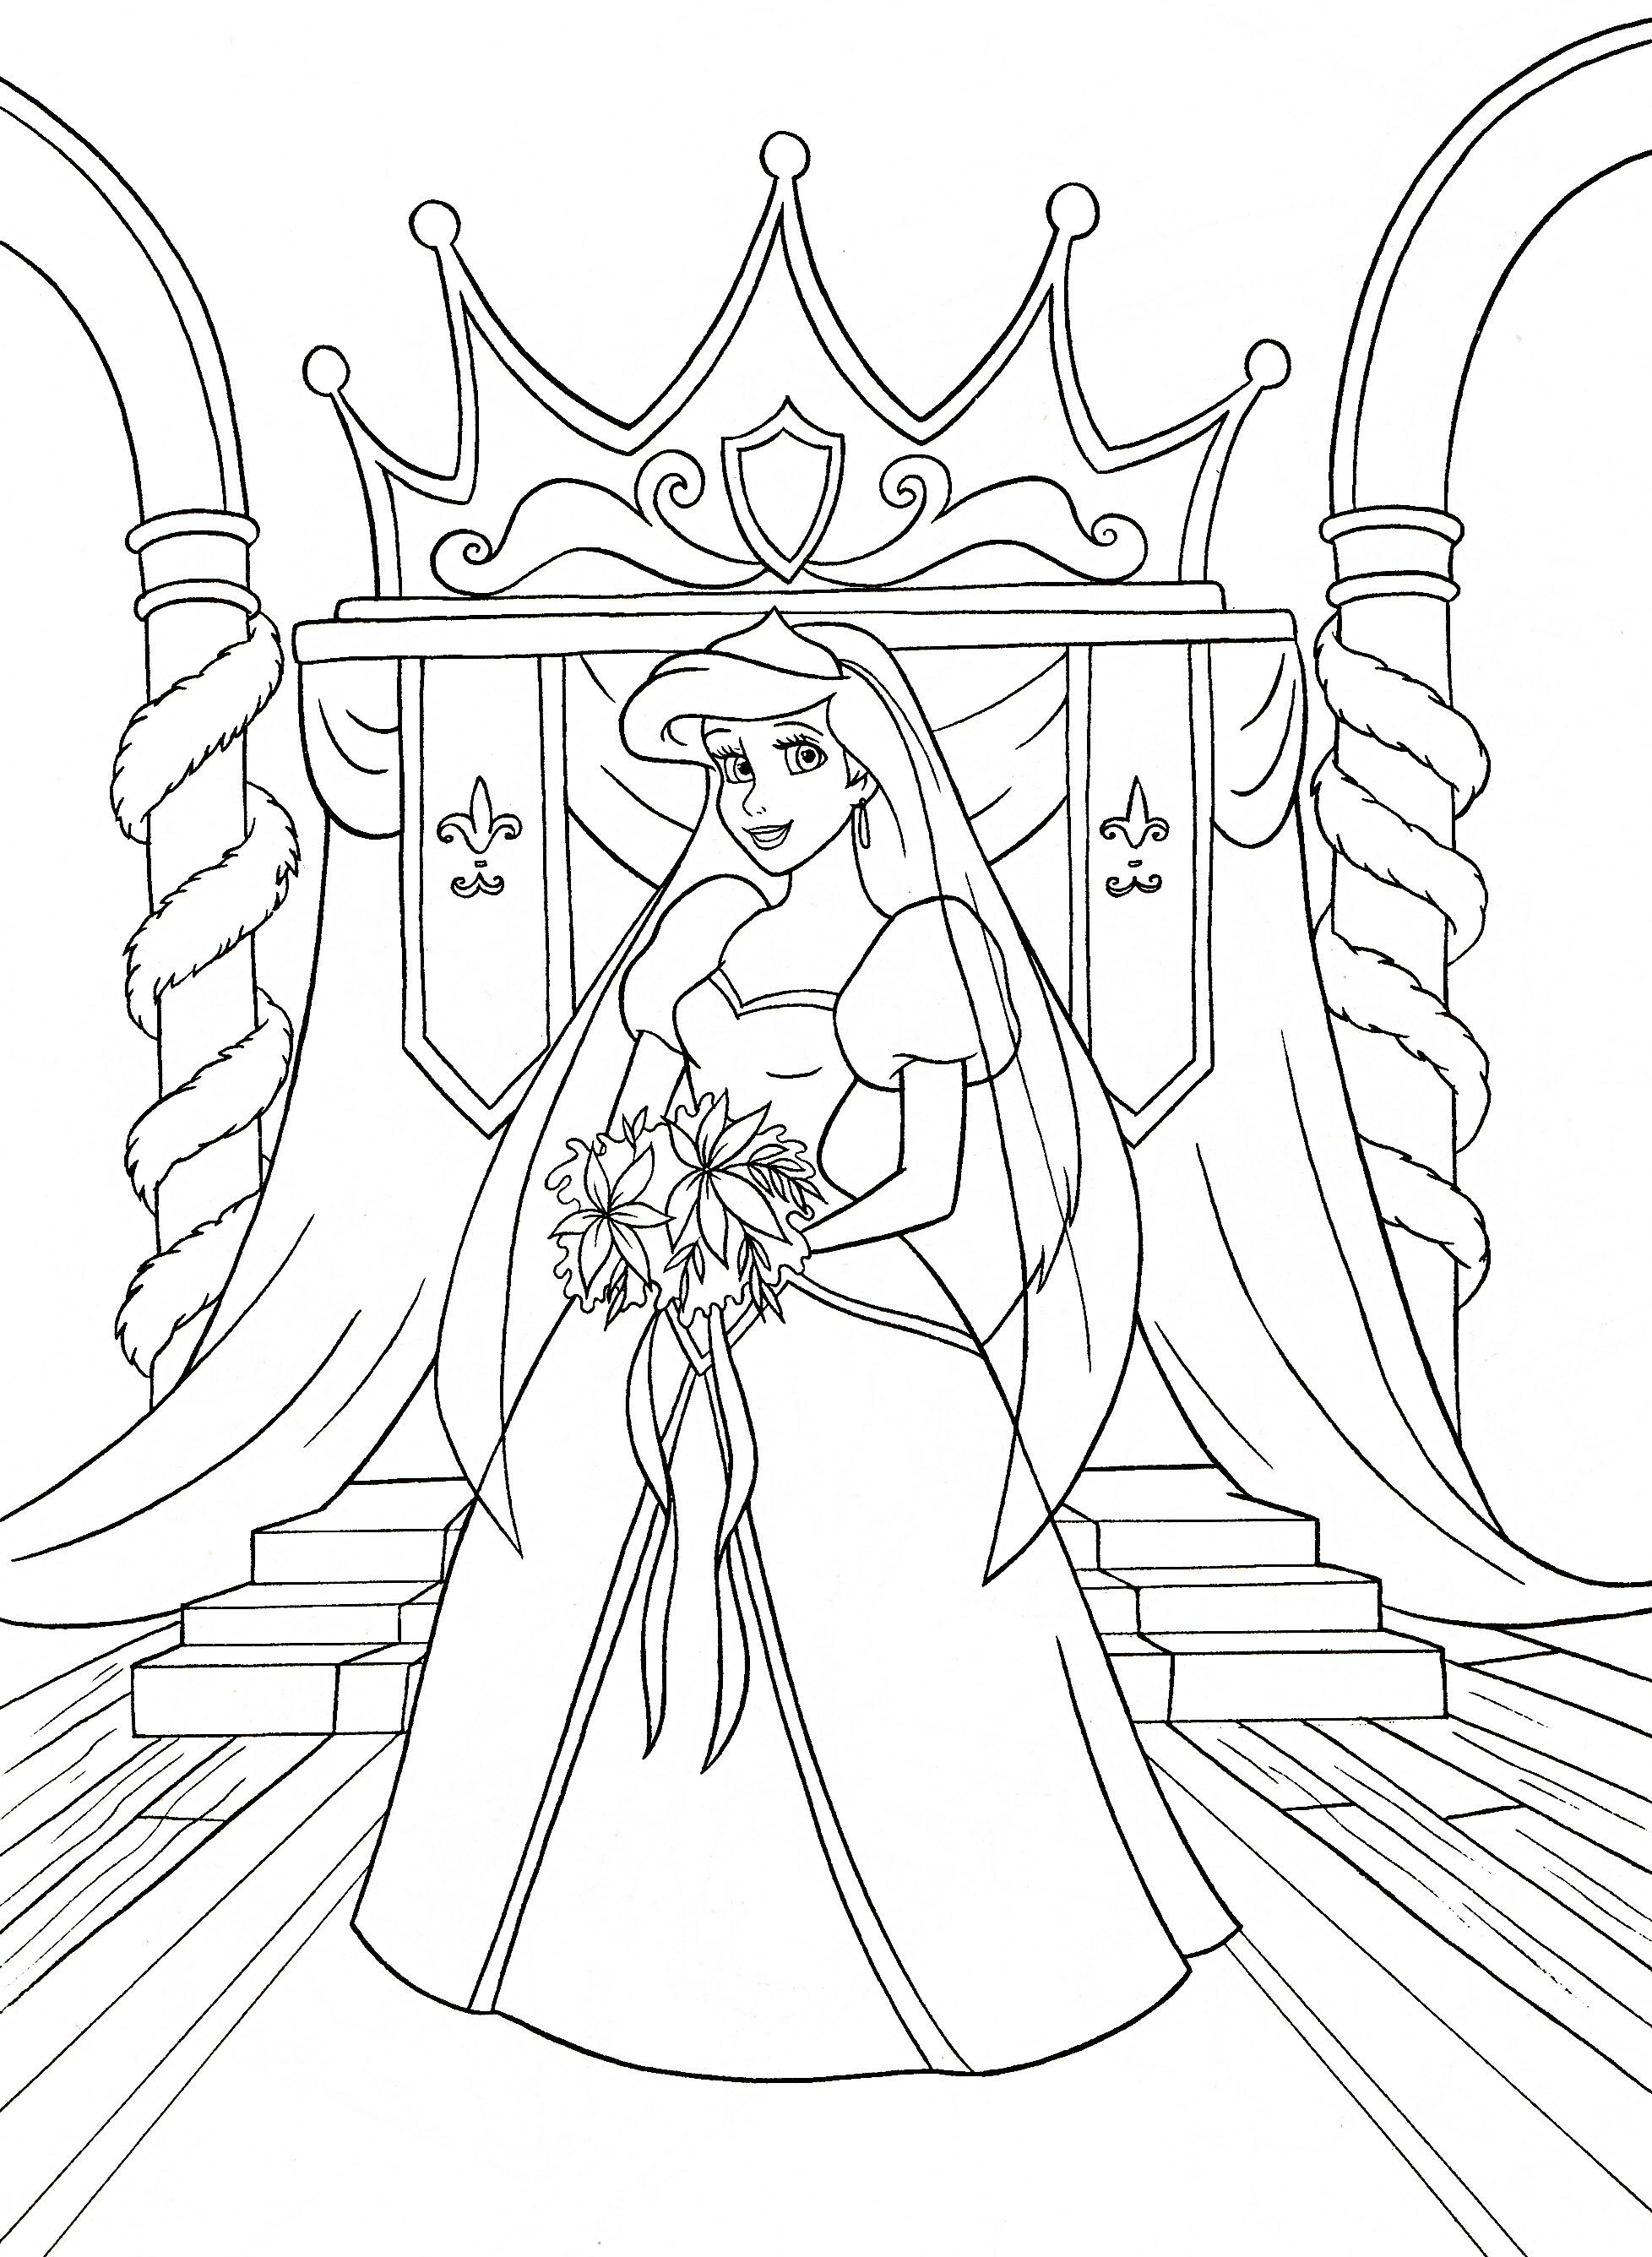 Walt Disney Coloring Pages - Princess Ariel - Walt Disney ...